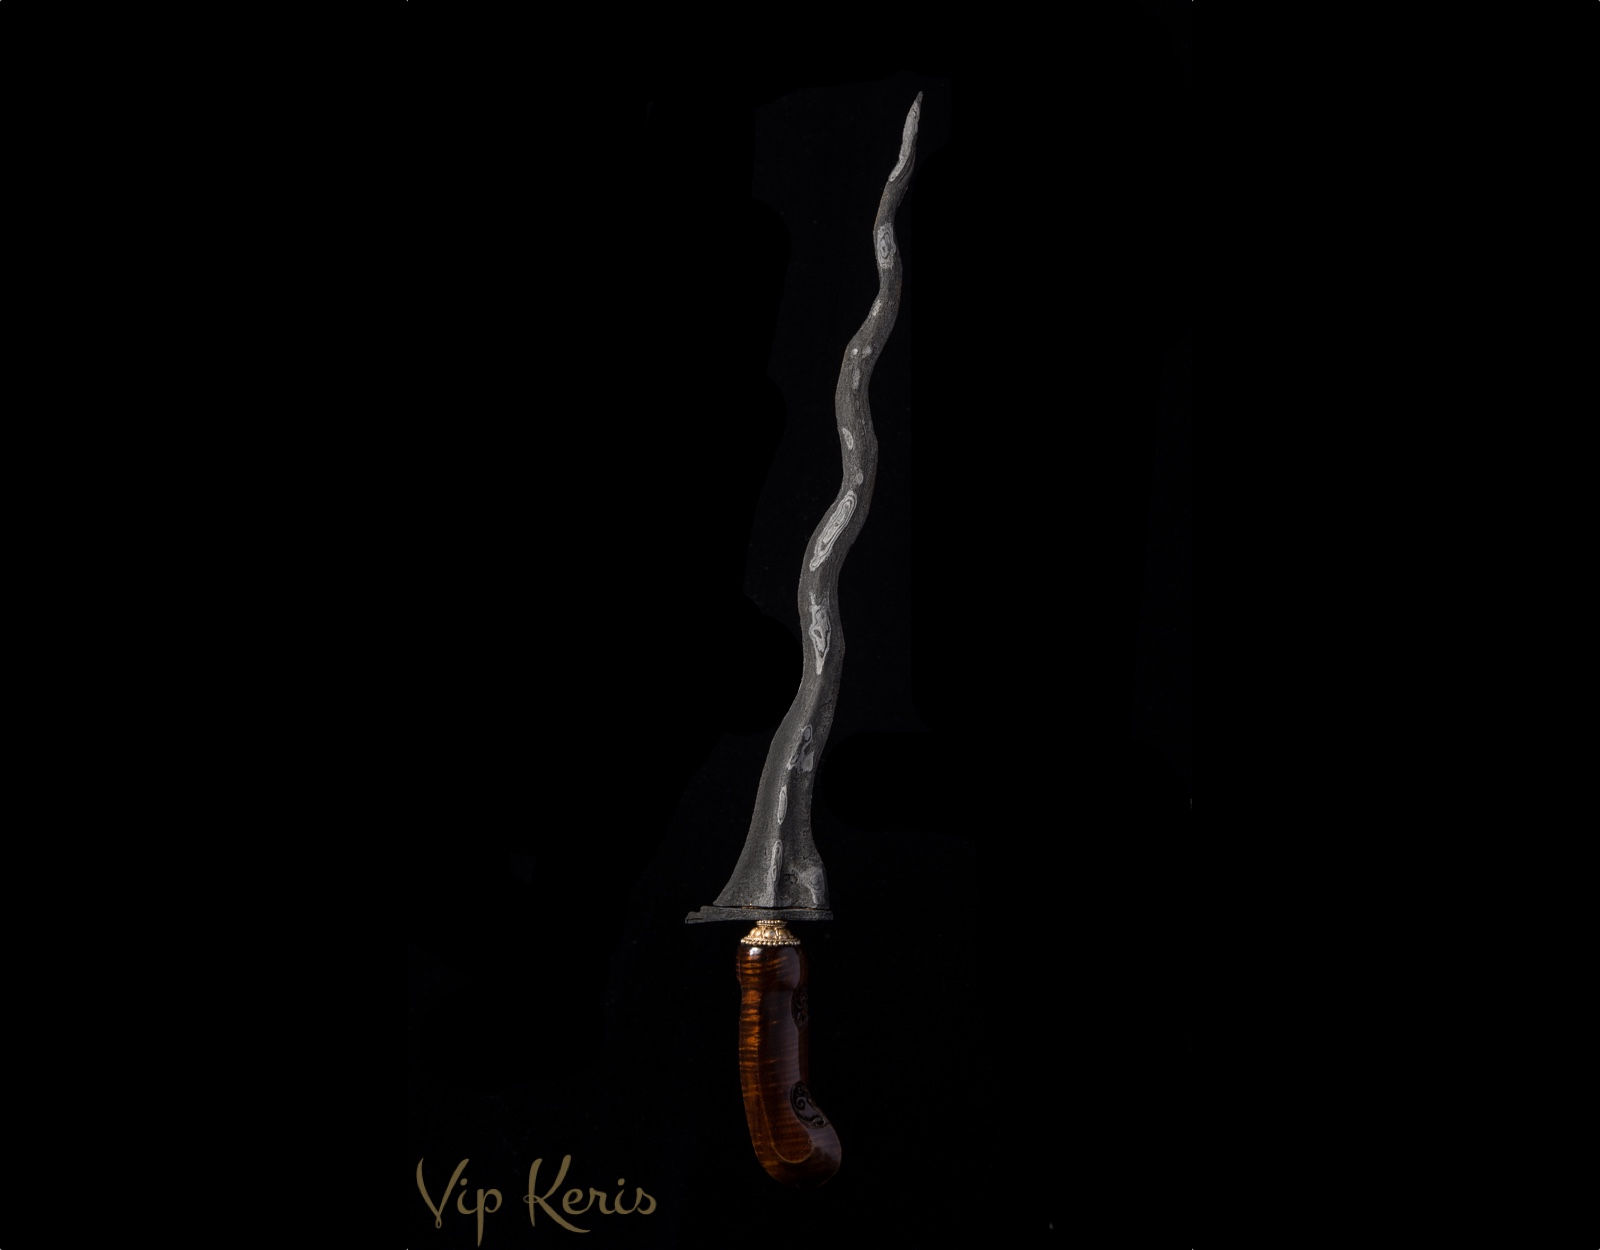 Кинжал Крис Buto Ijo 9 изгибов, 12 аркан фото VipKeris